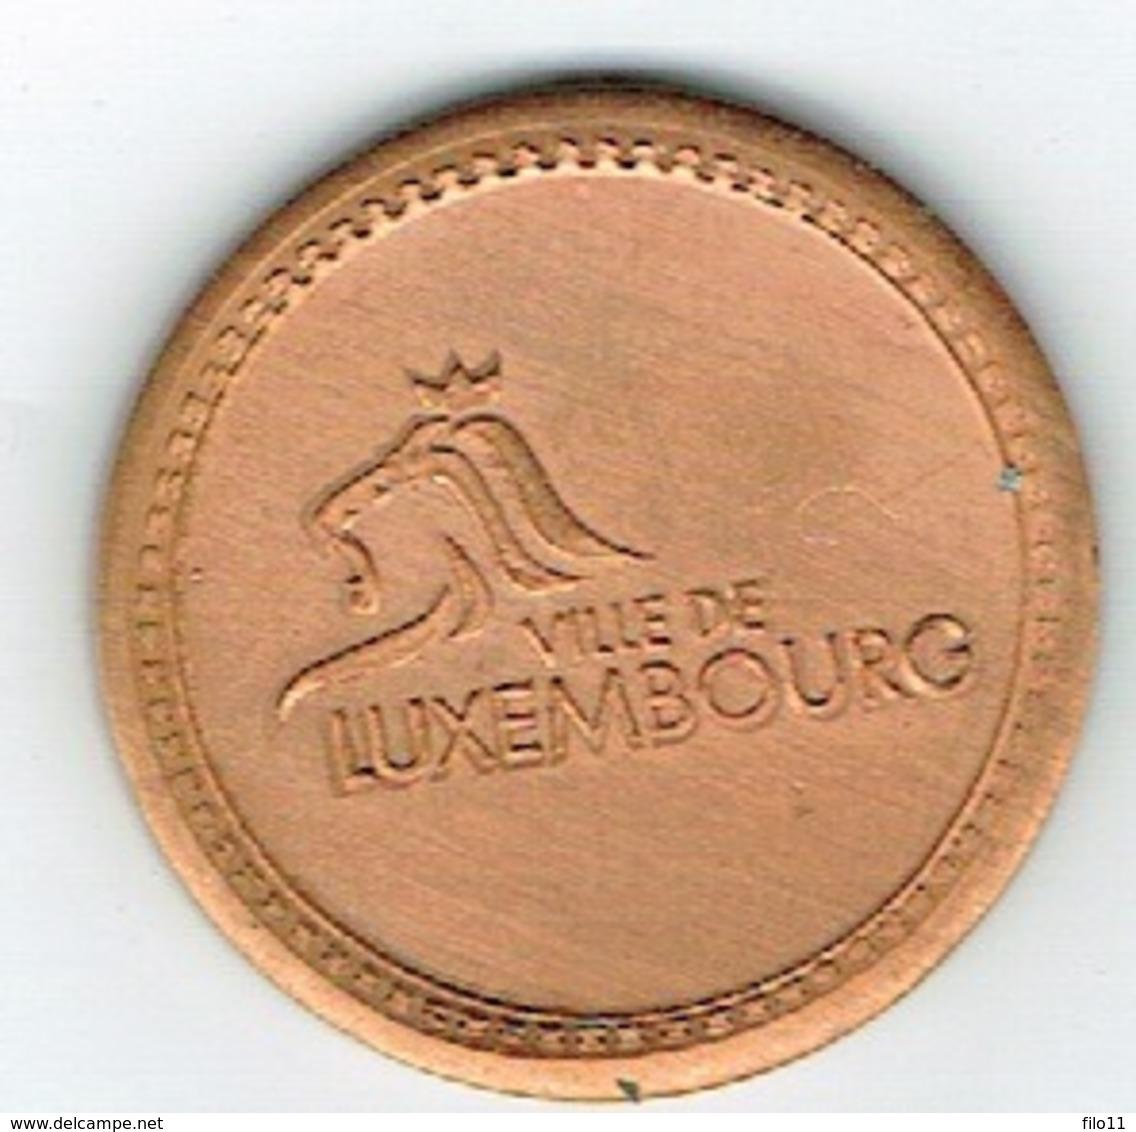 Luxembourg Jeton /Token Parking (Ville) Millenium In The City. - Jetons En Medailles